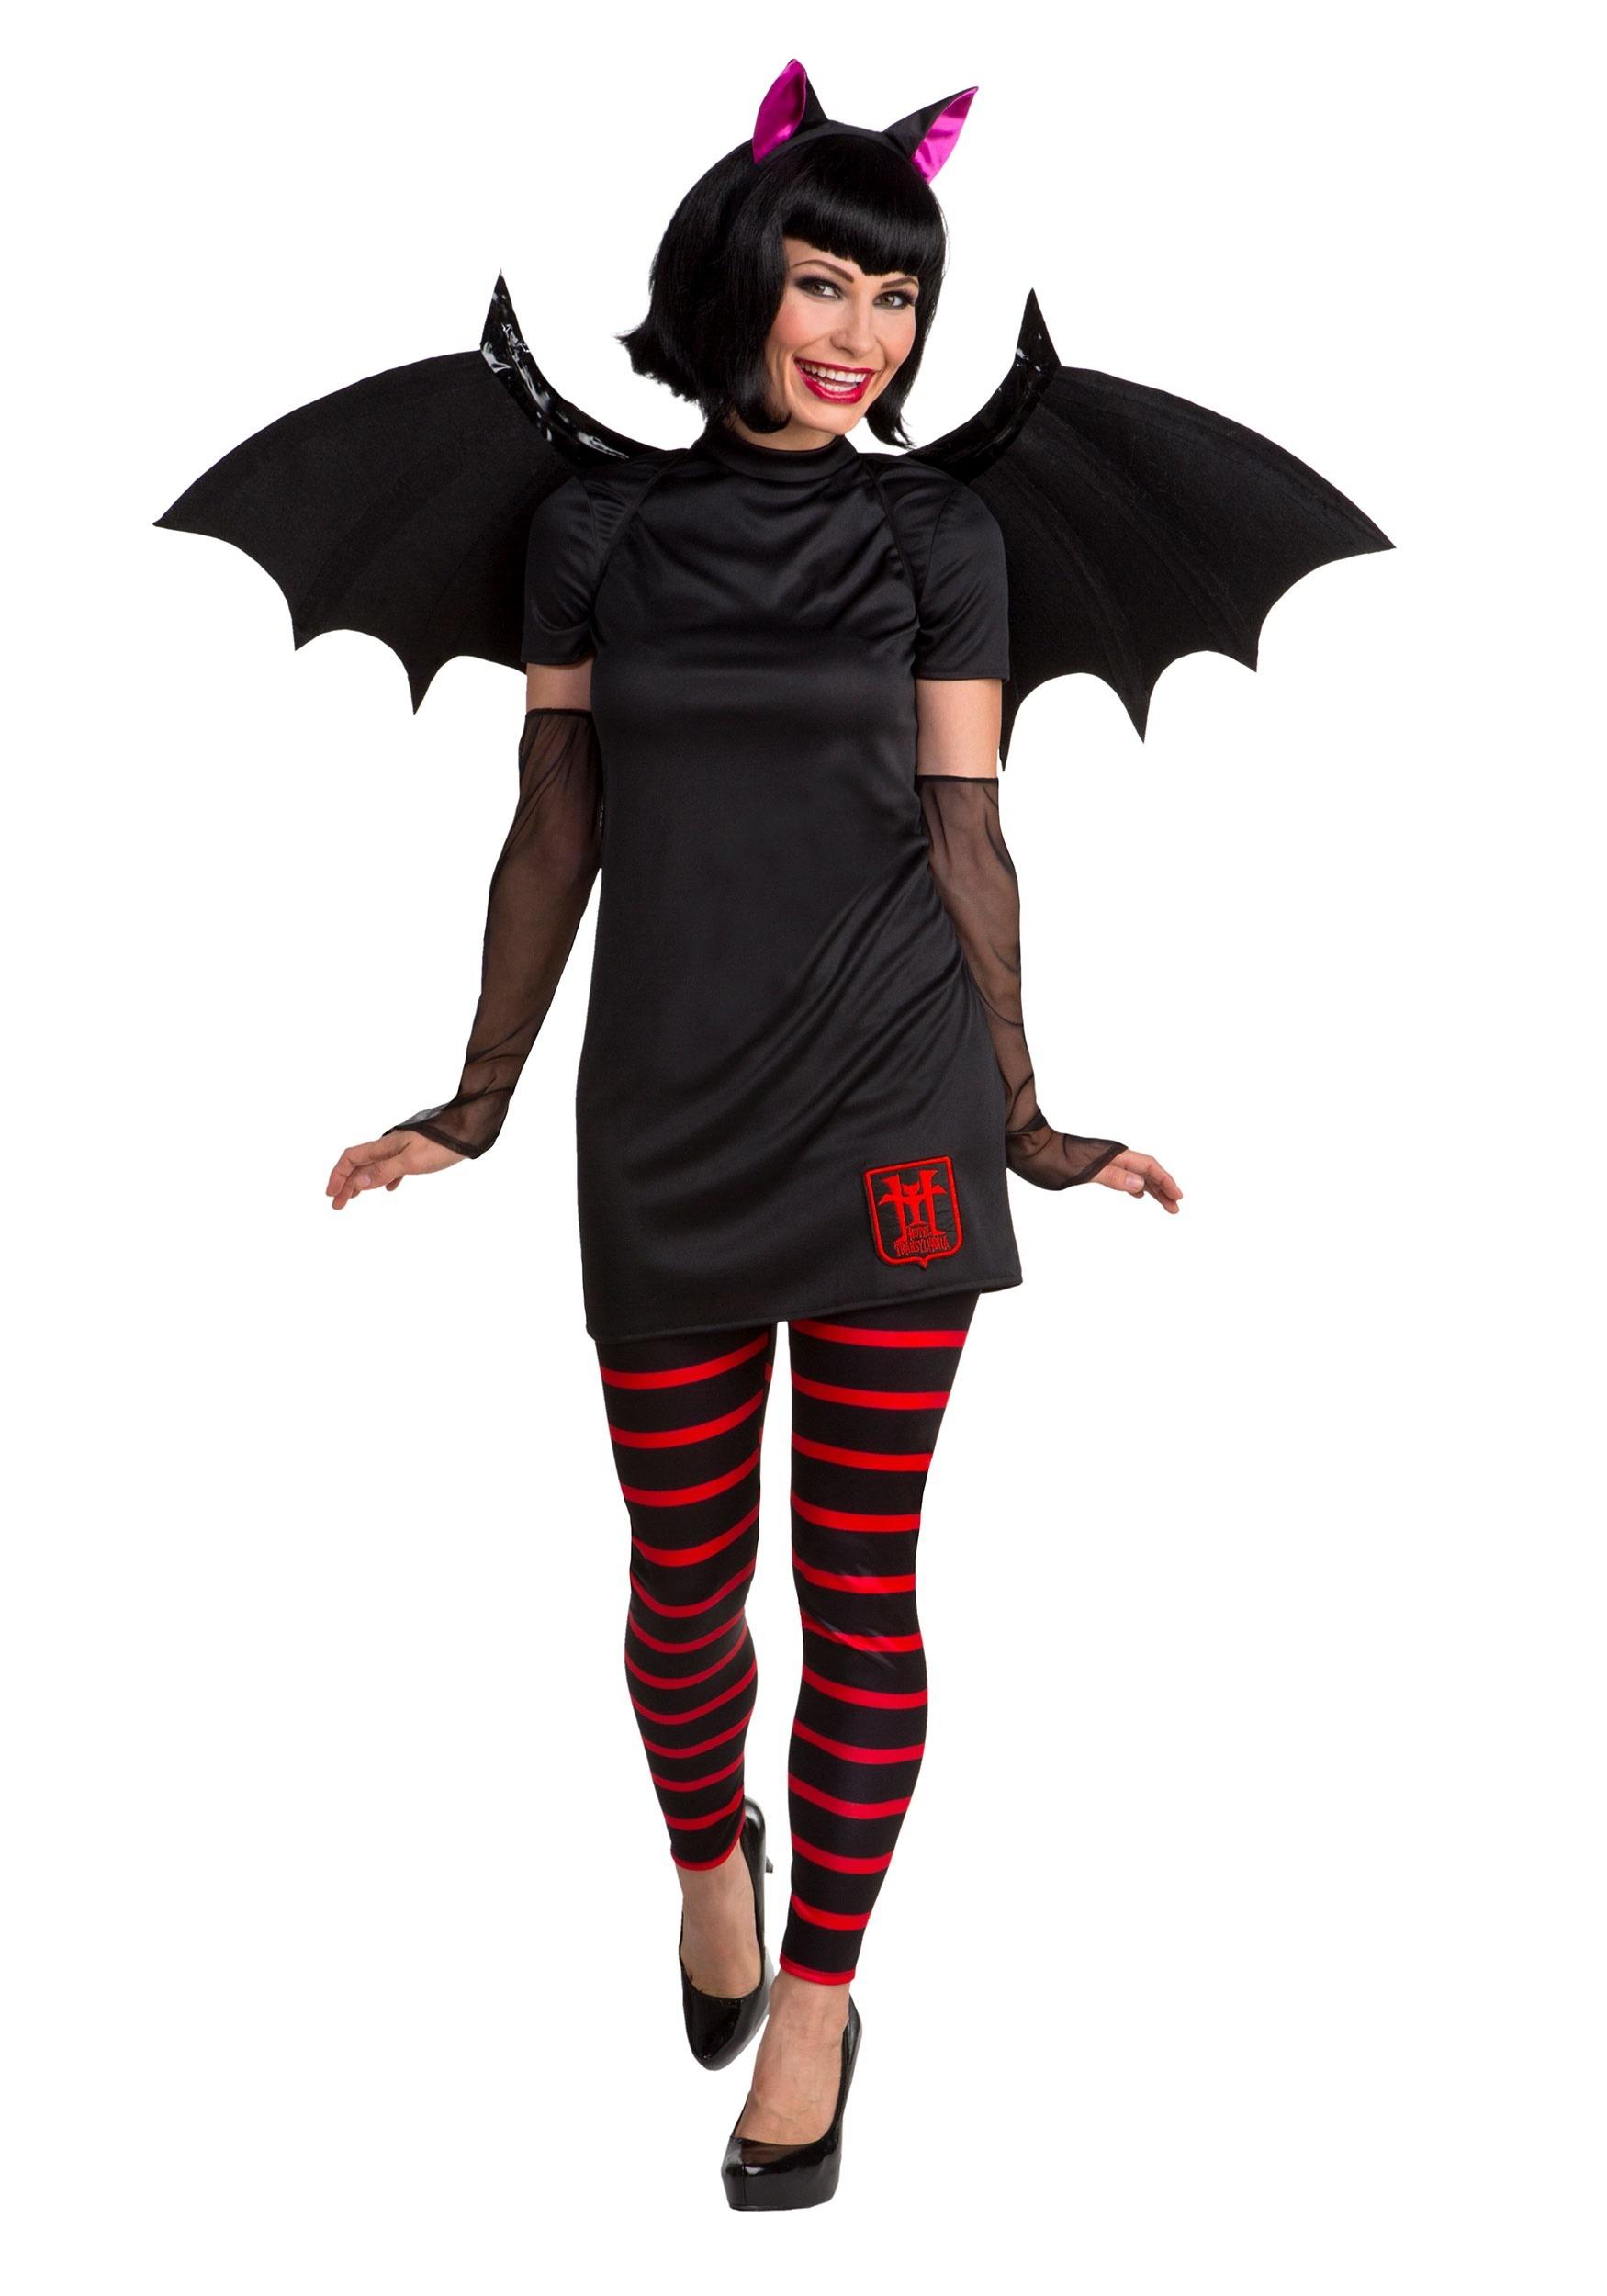 Hotel Transylvania Mavis Costume for Women 391c036d21